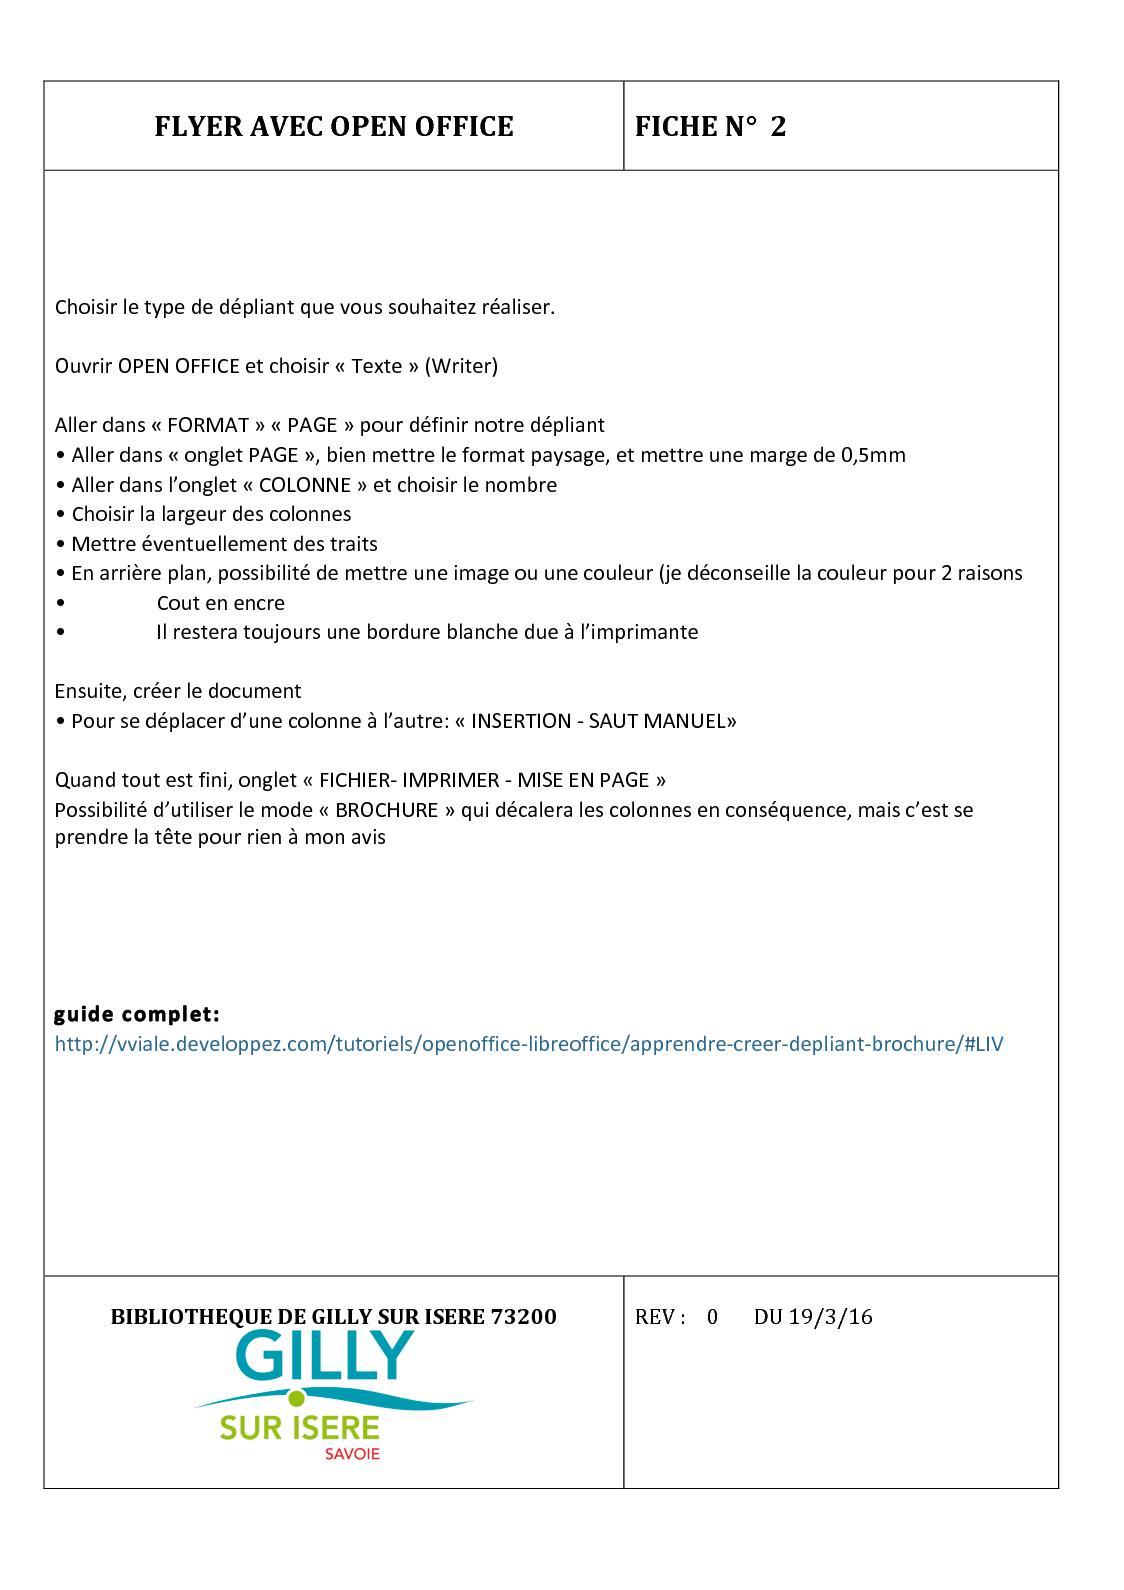 Calaméo 2 Flyer Avec Open Office